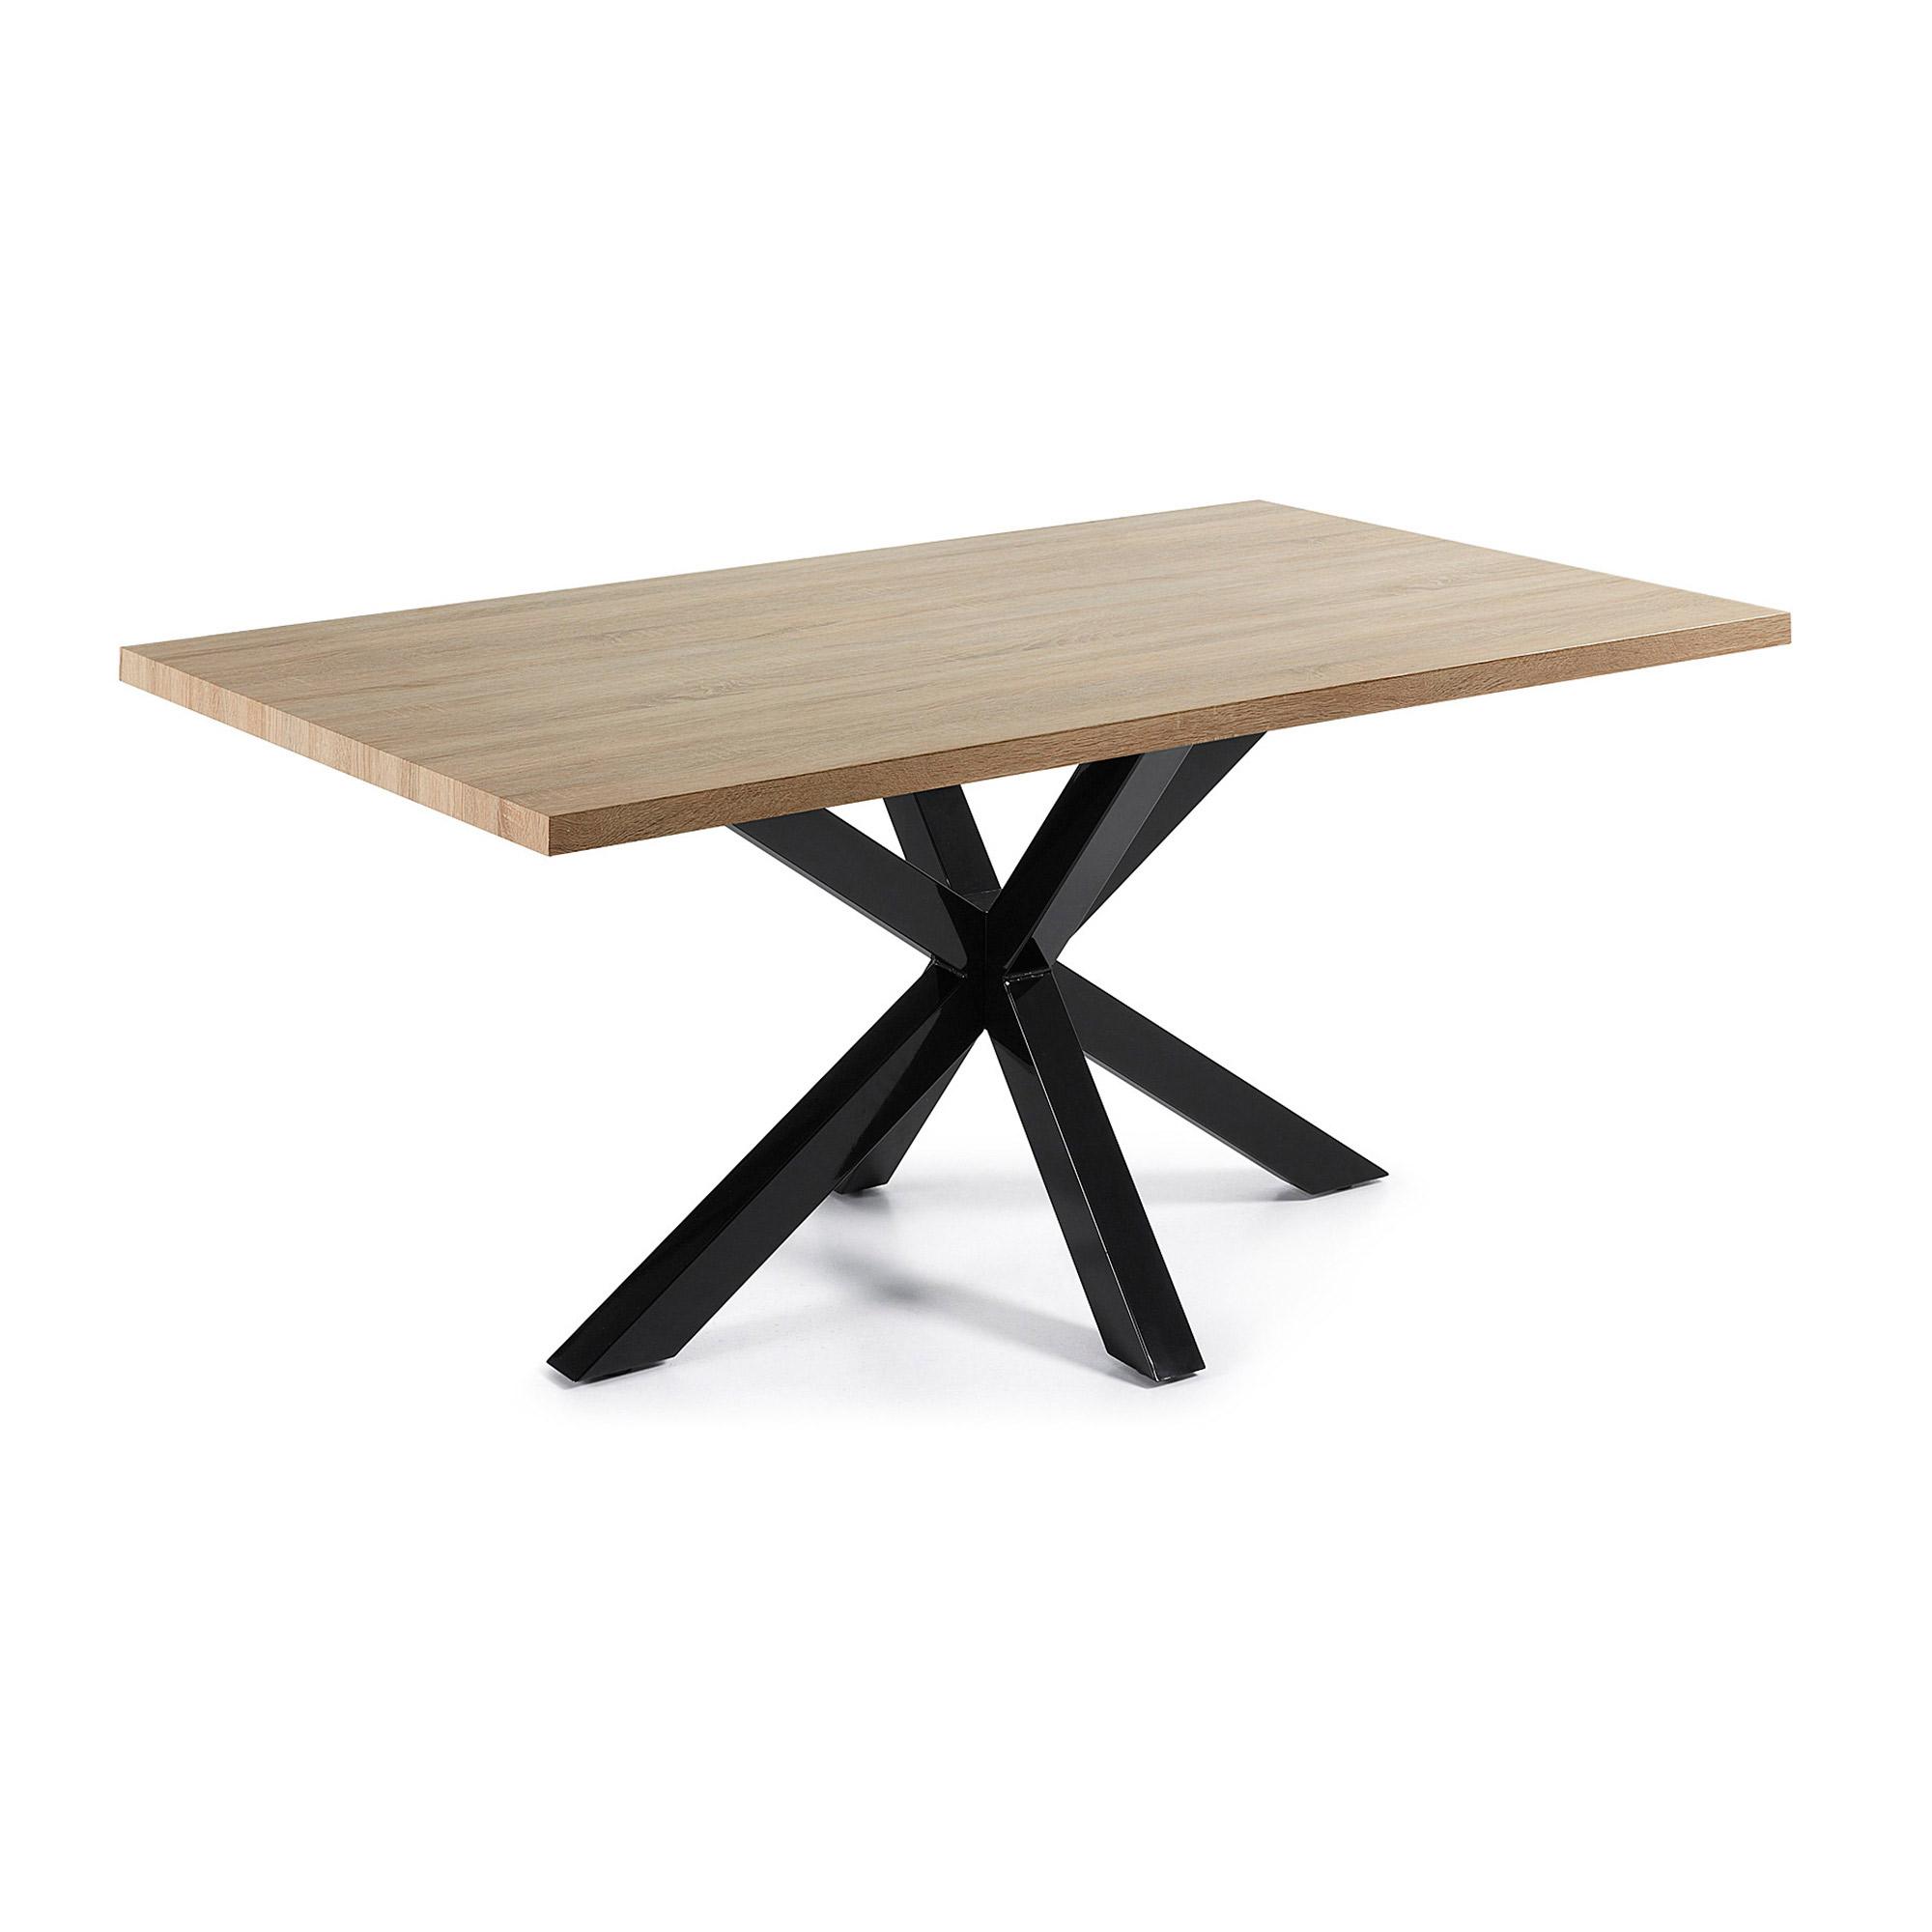 Kave Home Eettafel 'Argo' zwart / hout, 160 x 90cm